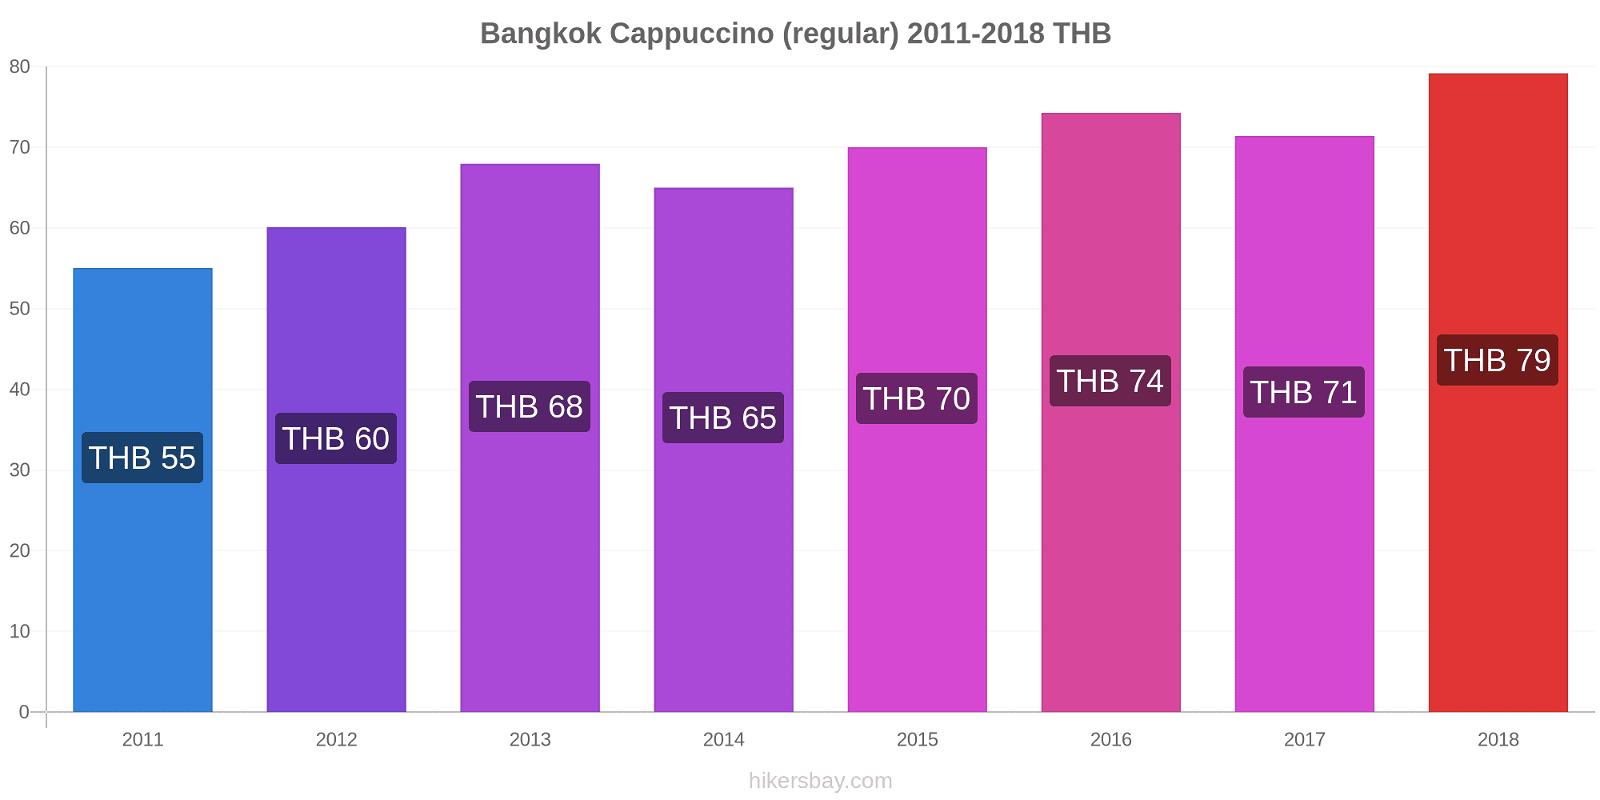 Bangkok price changes Cappuccino (regular) hikersbay.com